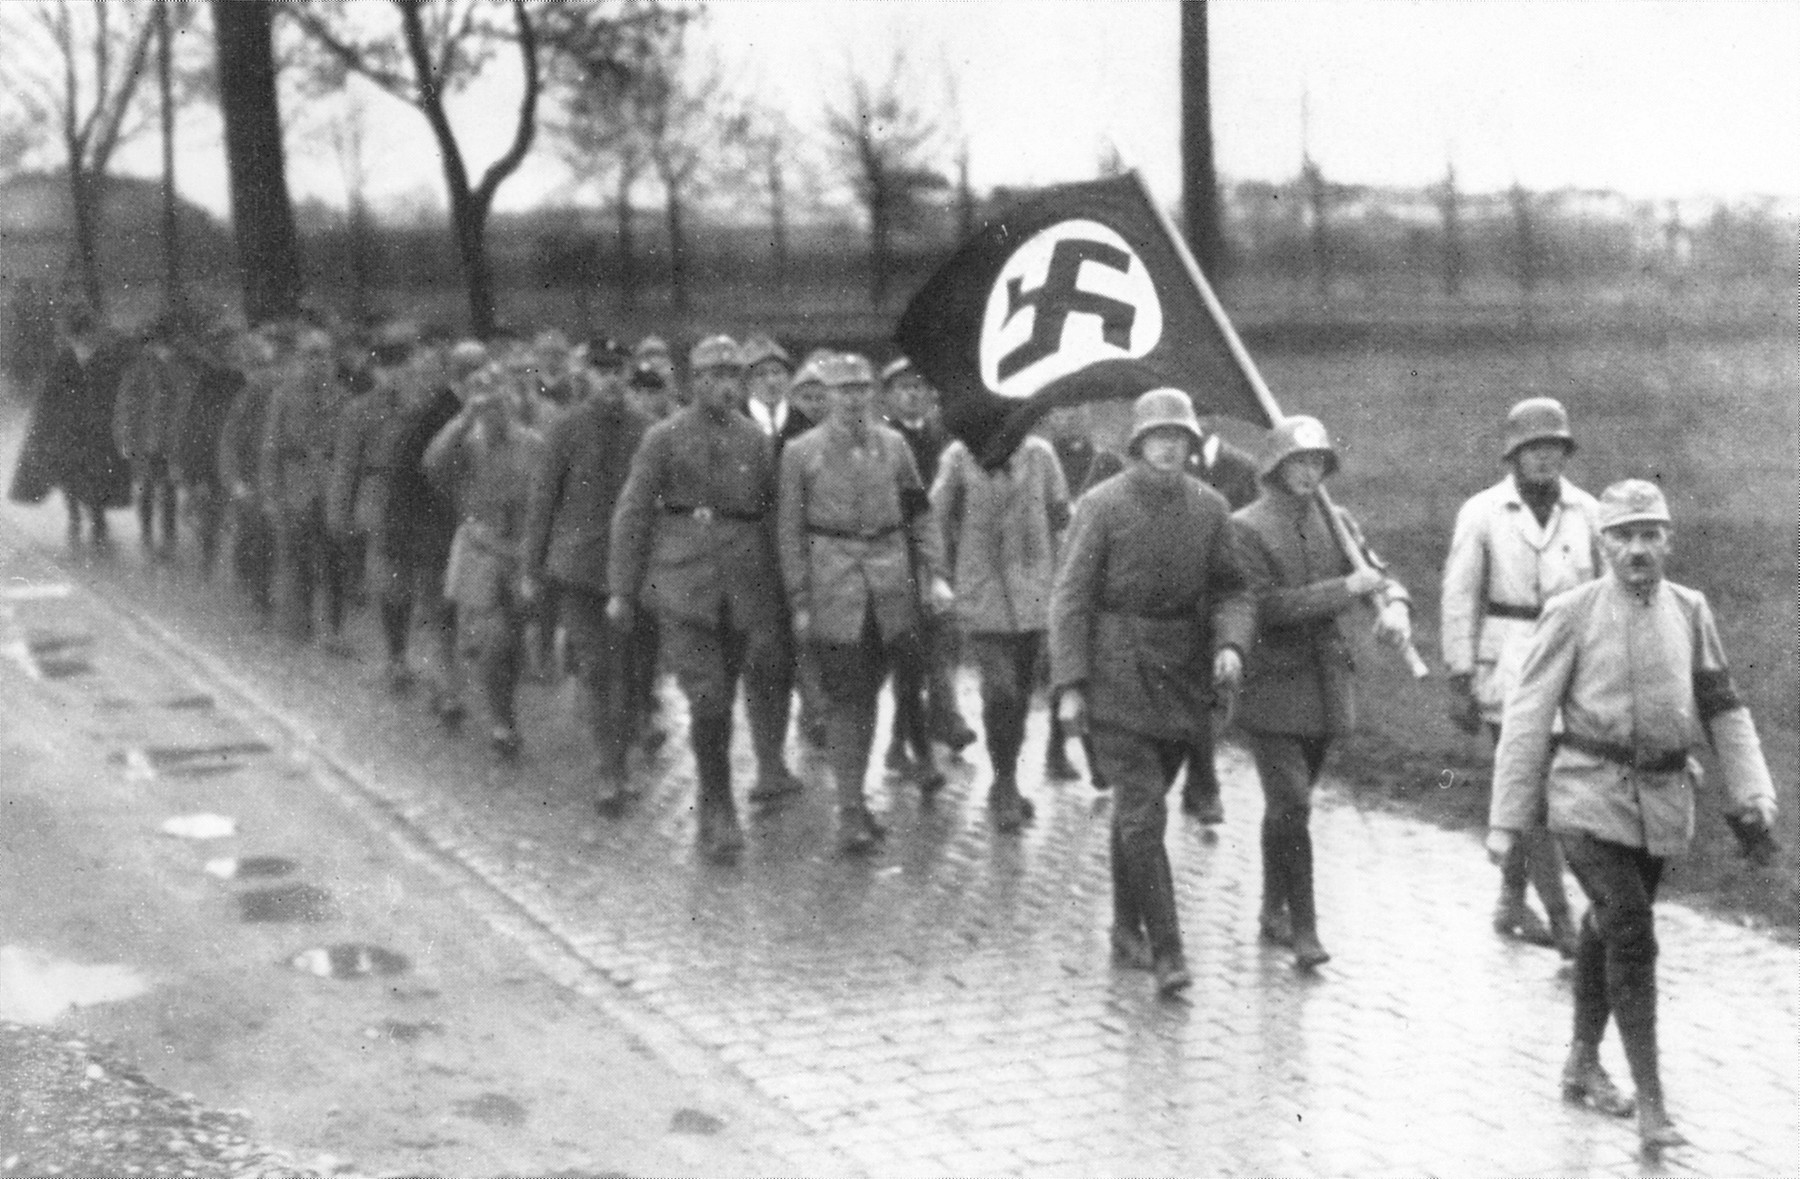 SA members march in a long column along a street in Munich.